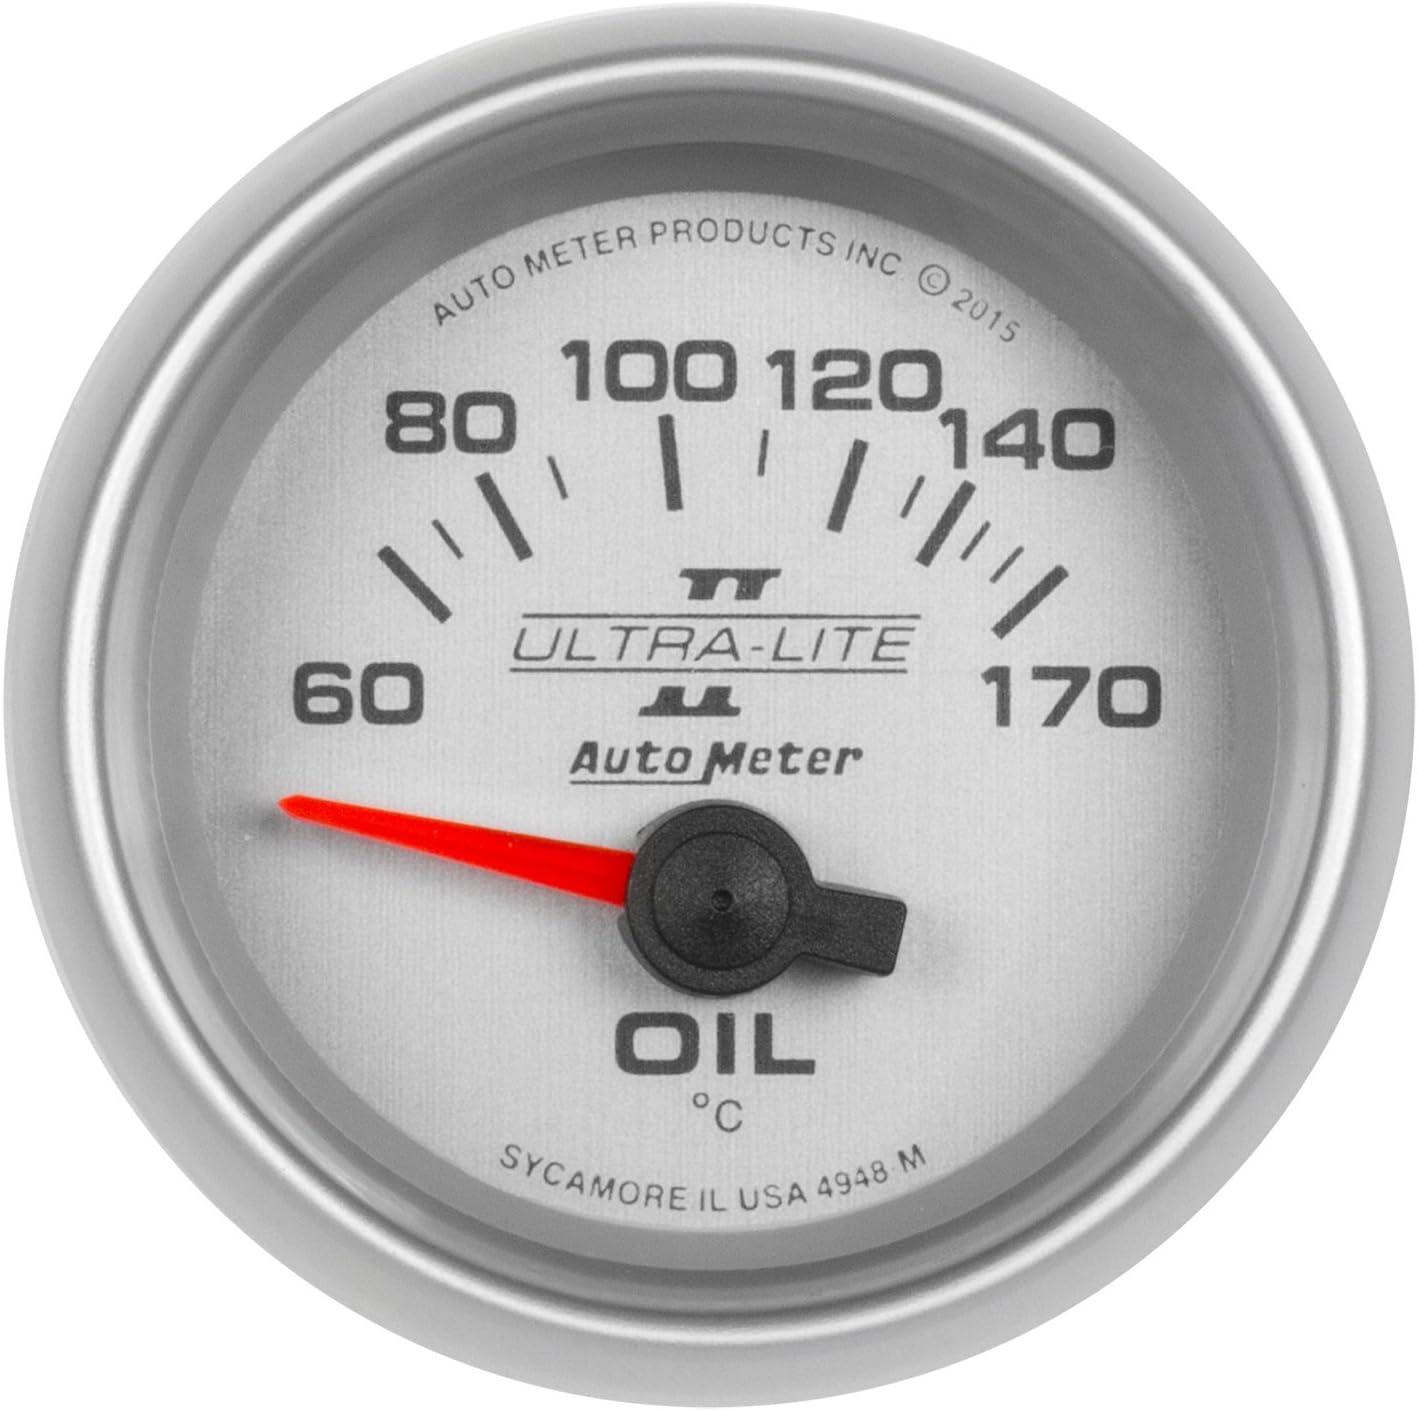 AUTO METER 4948-M Gauge Oil Temp 60-170Ã Large discharge sale II 1 Brand new Ultra-Lite 16